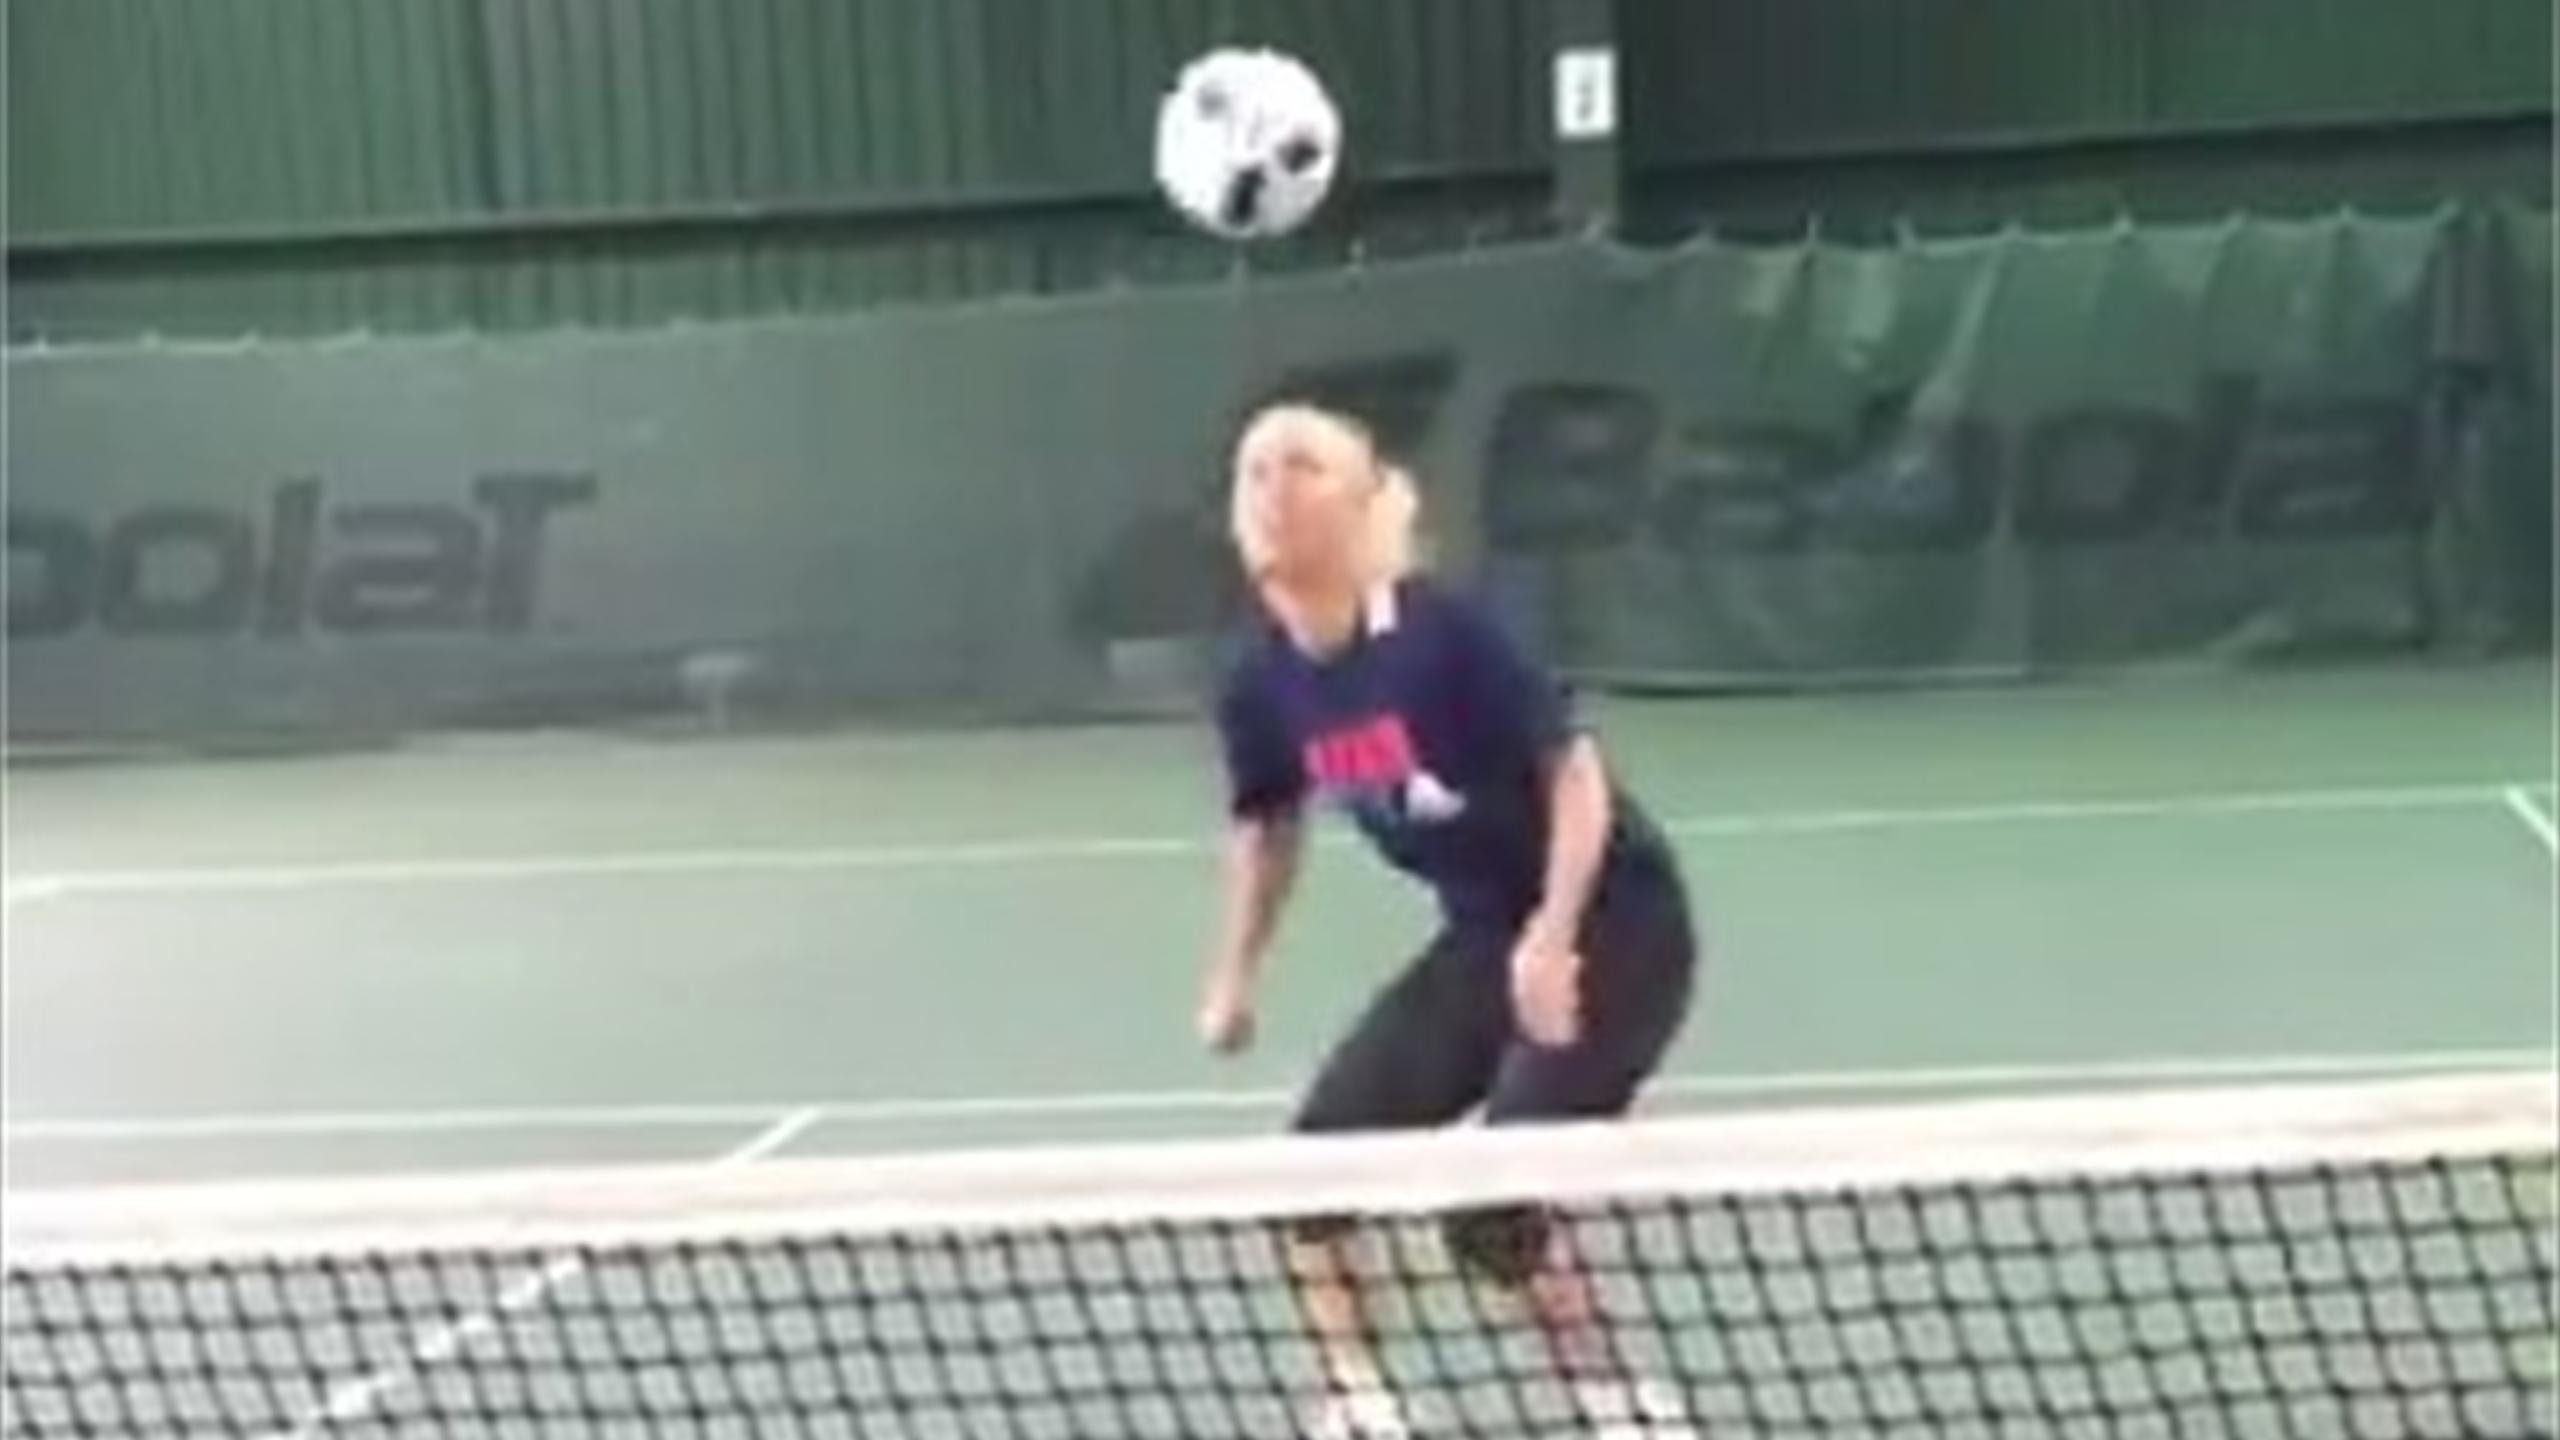 Caroline Wozniacki flaunts football skills… 'what happens during rain delays!' (Twitter)